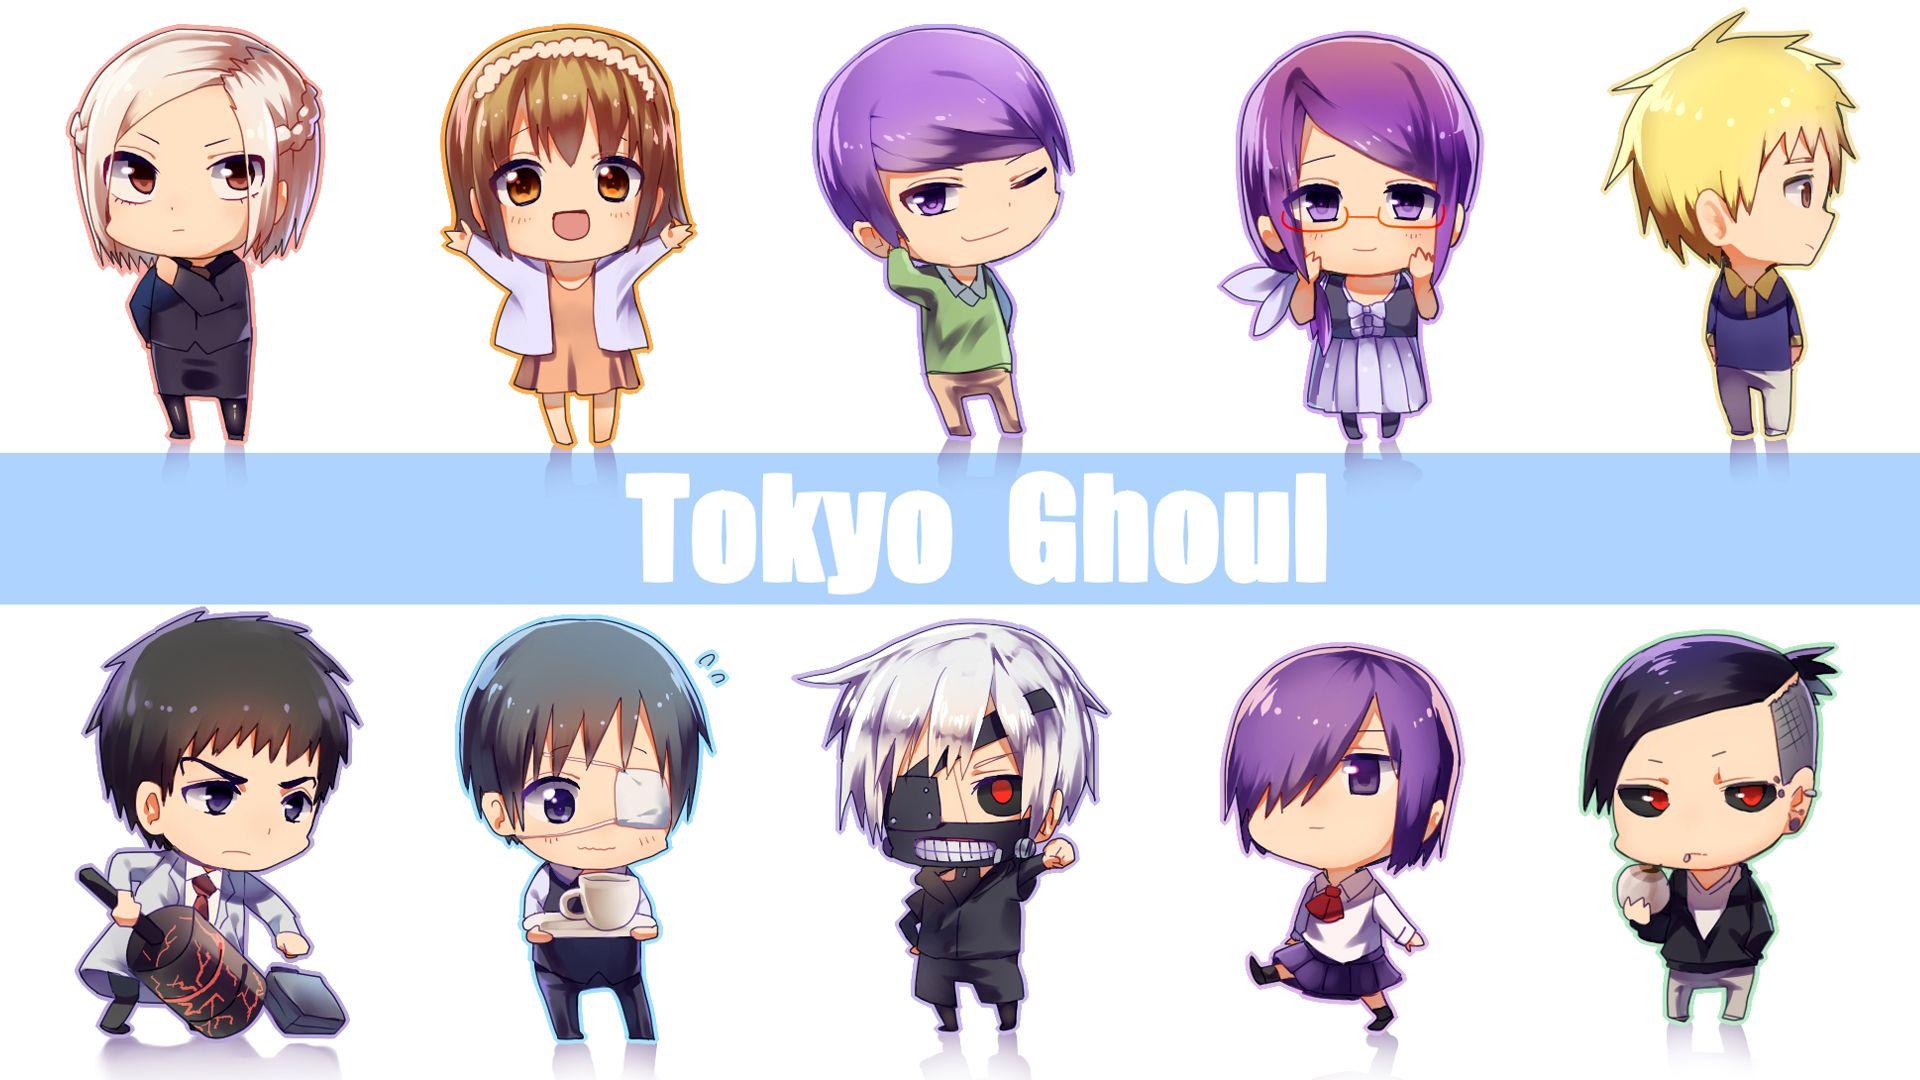 Google themes anime tokyo ghoul - Tokyo Ghoul Pesquisa Google